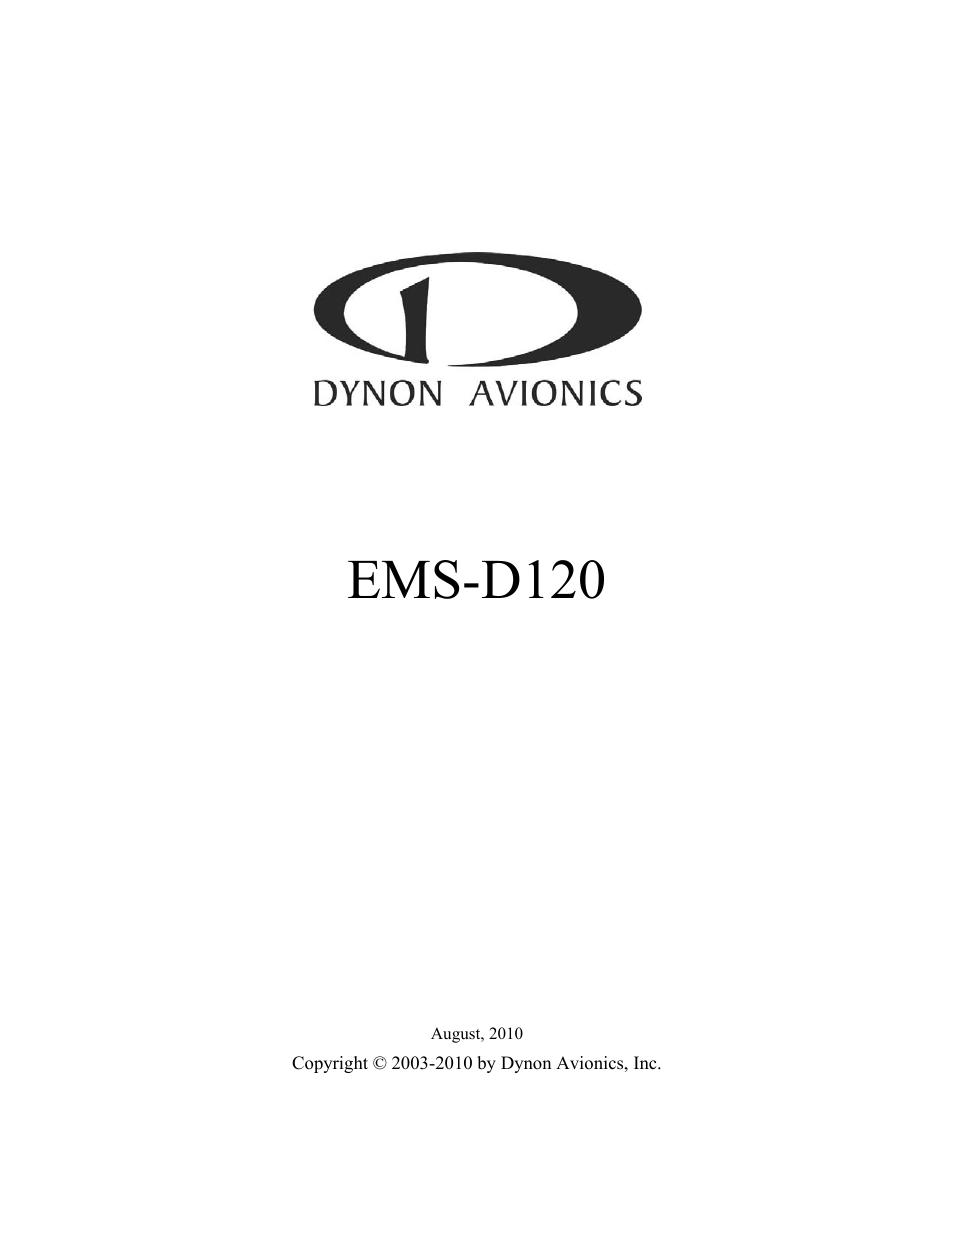 Dynon Avionics EMS-D120 Installation Guide User Manual